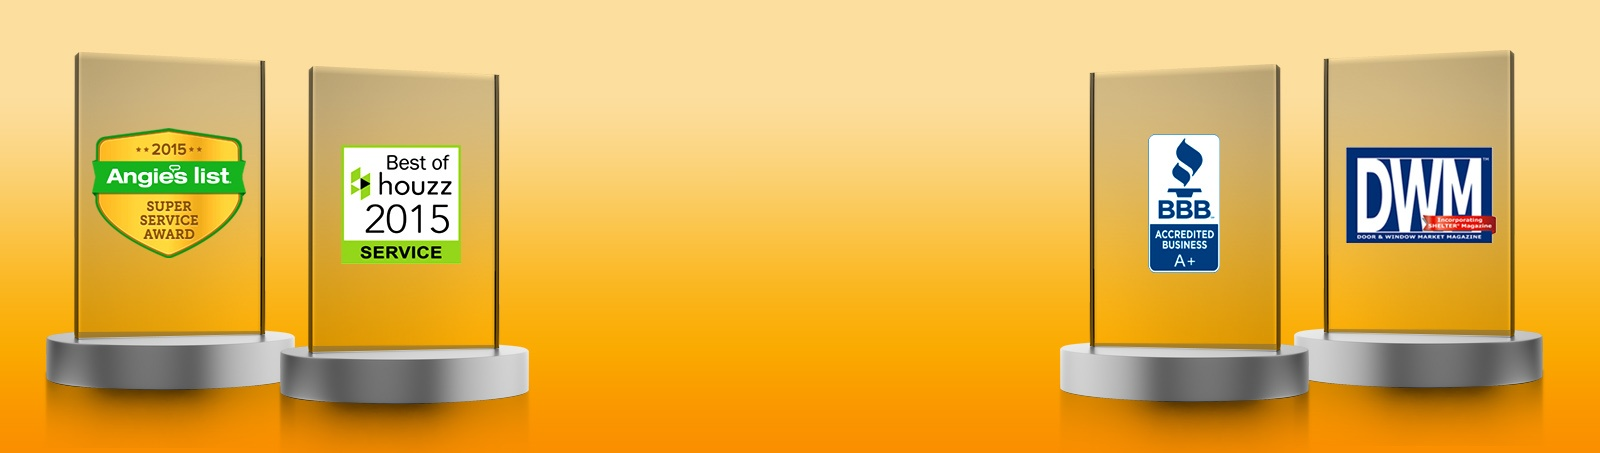 WoW_homepage_bannertextless_Fall2016.jpg